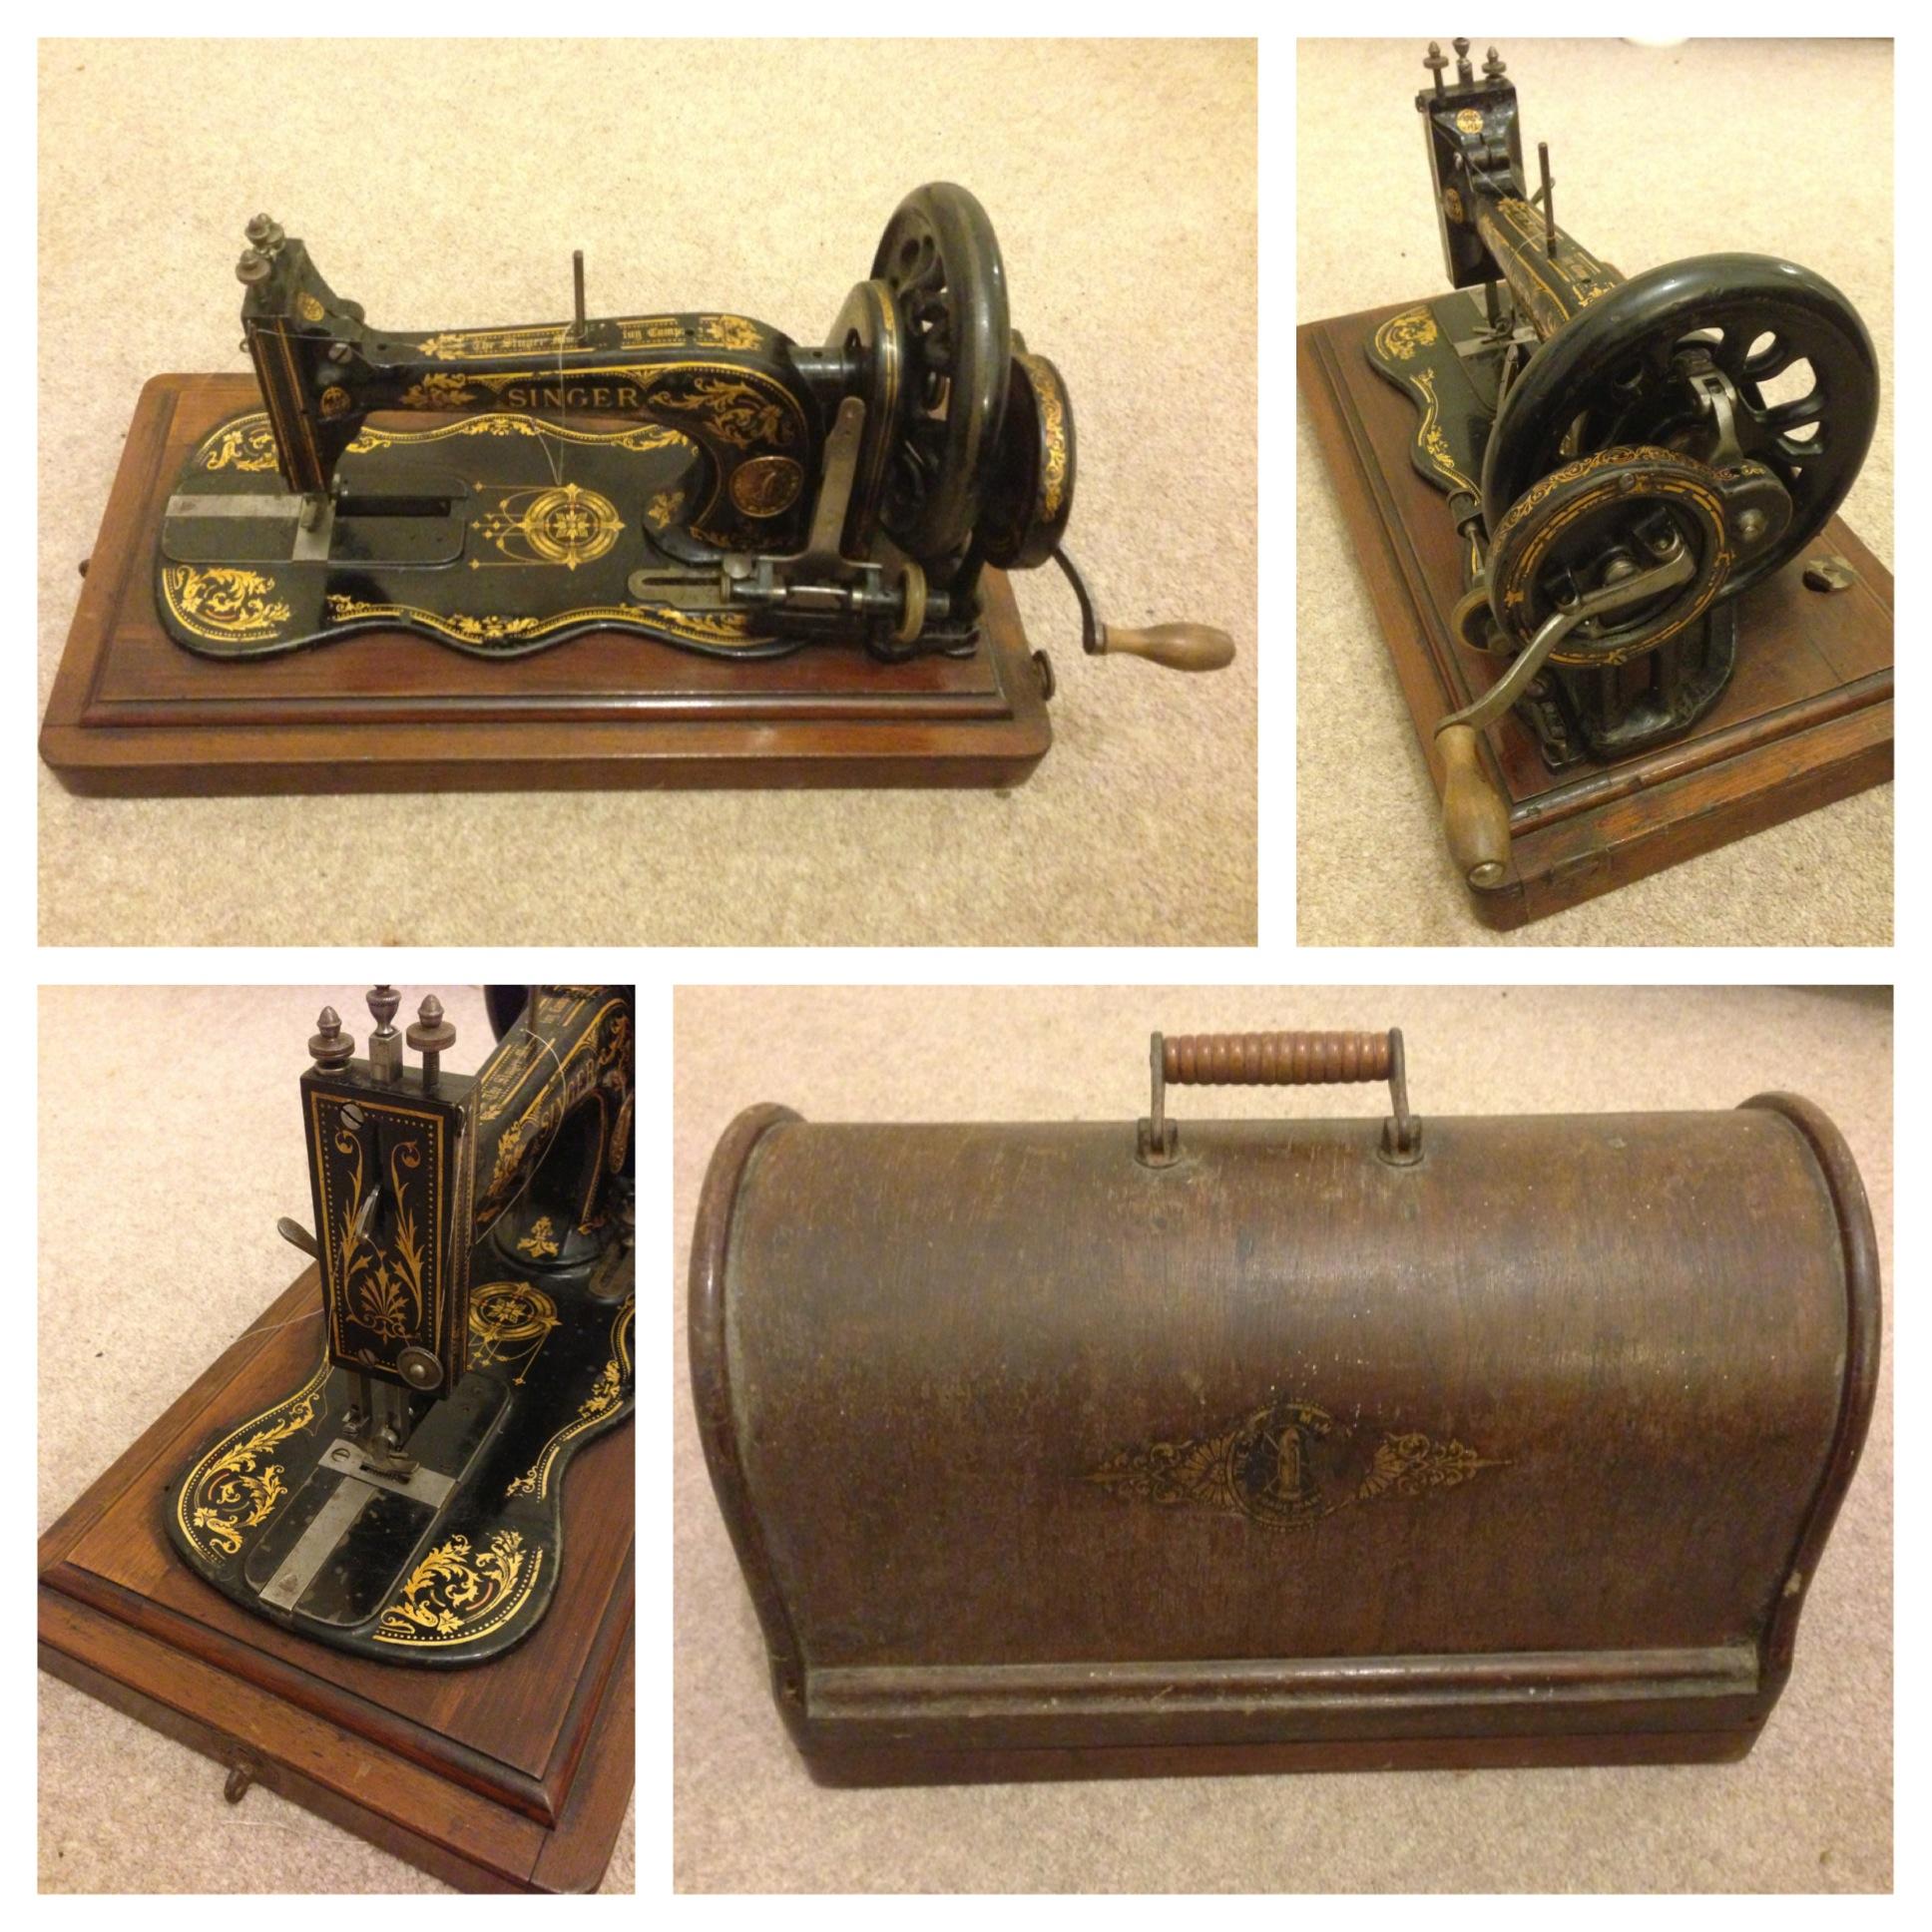 My 1890 Singer Sewing Machine